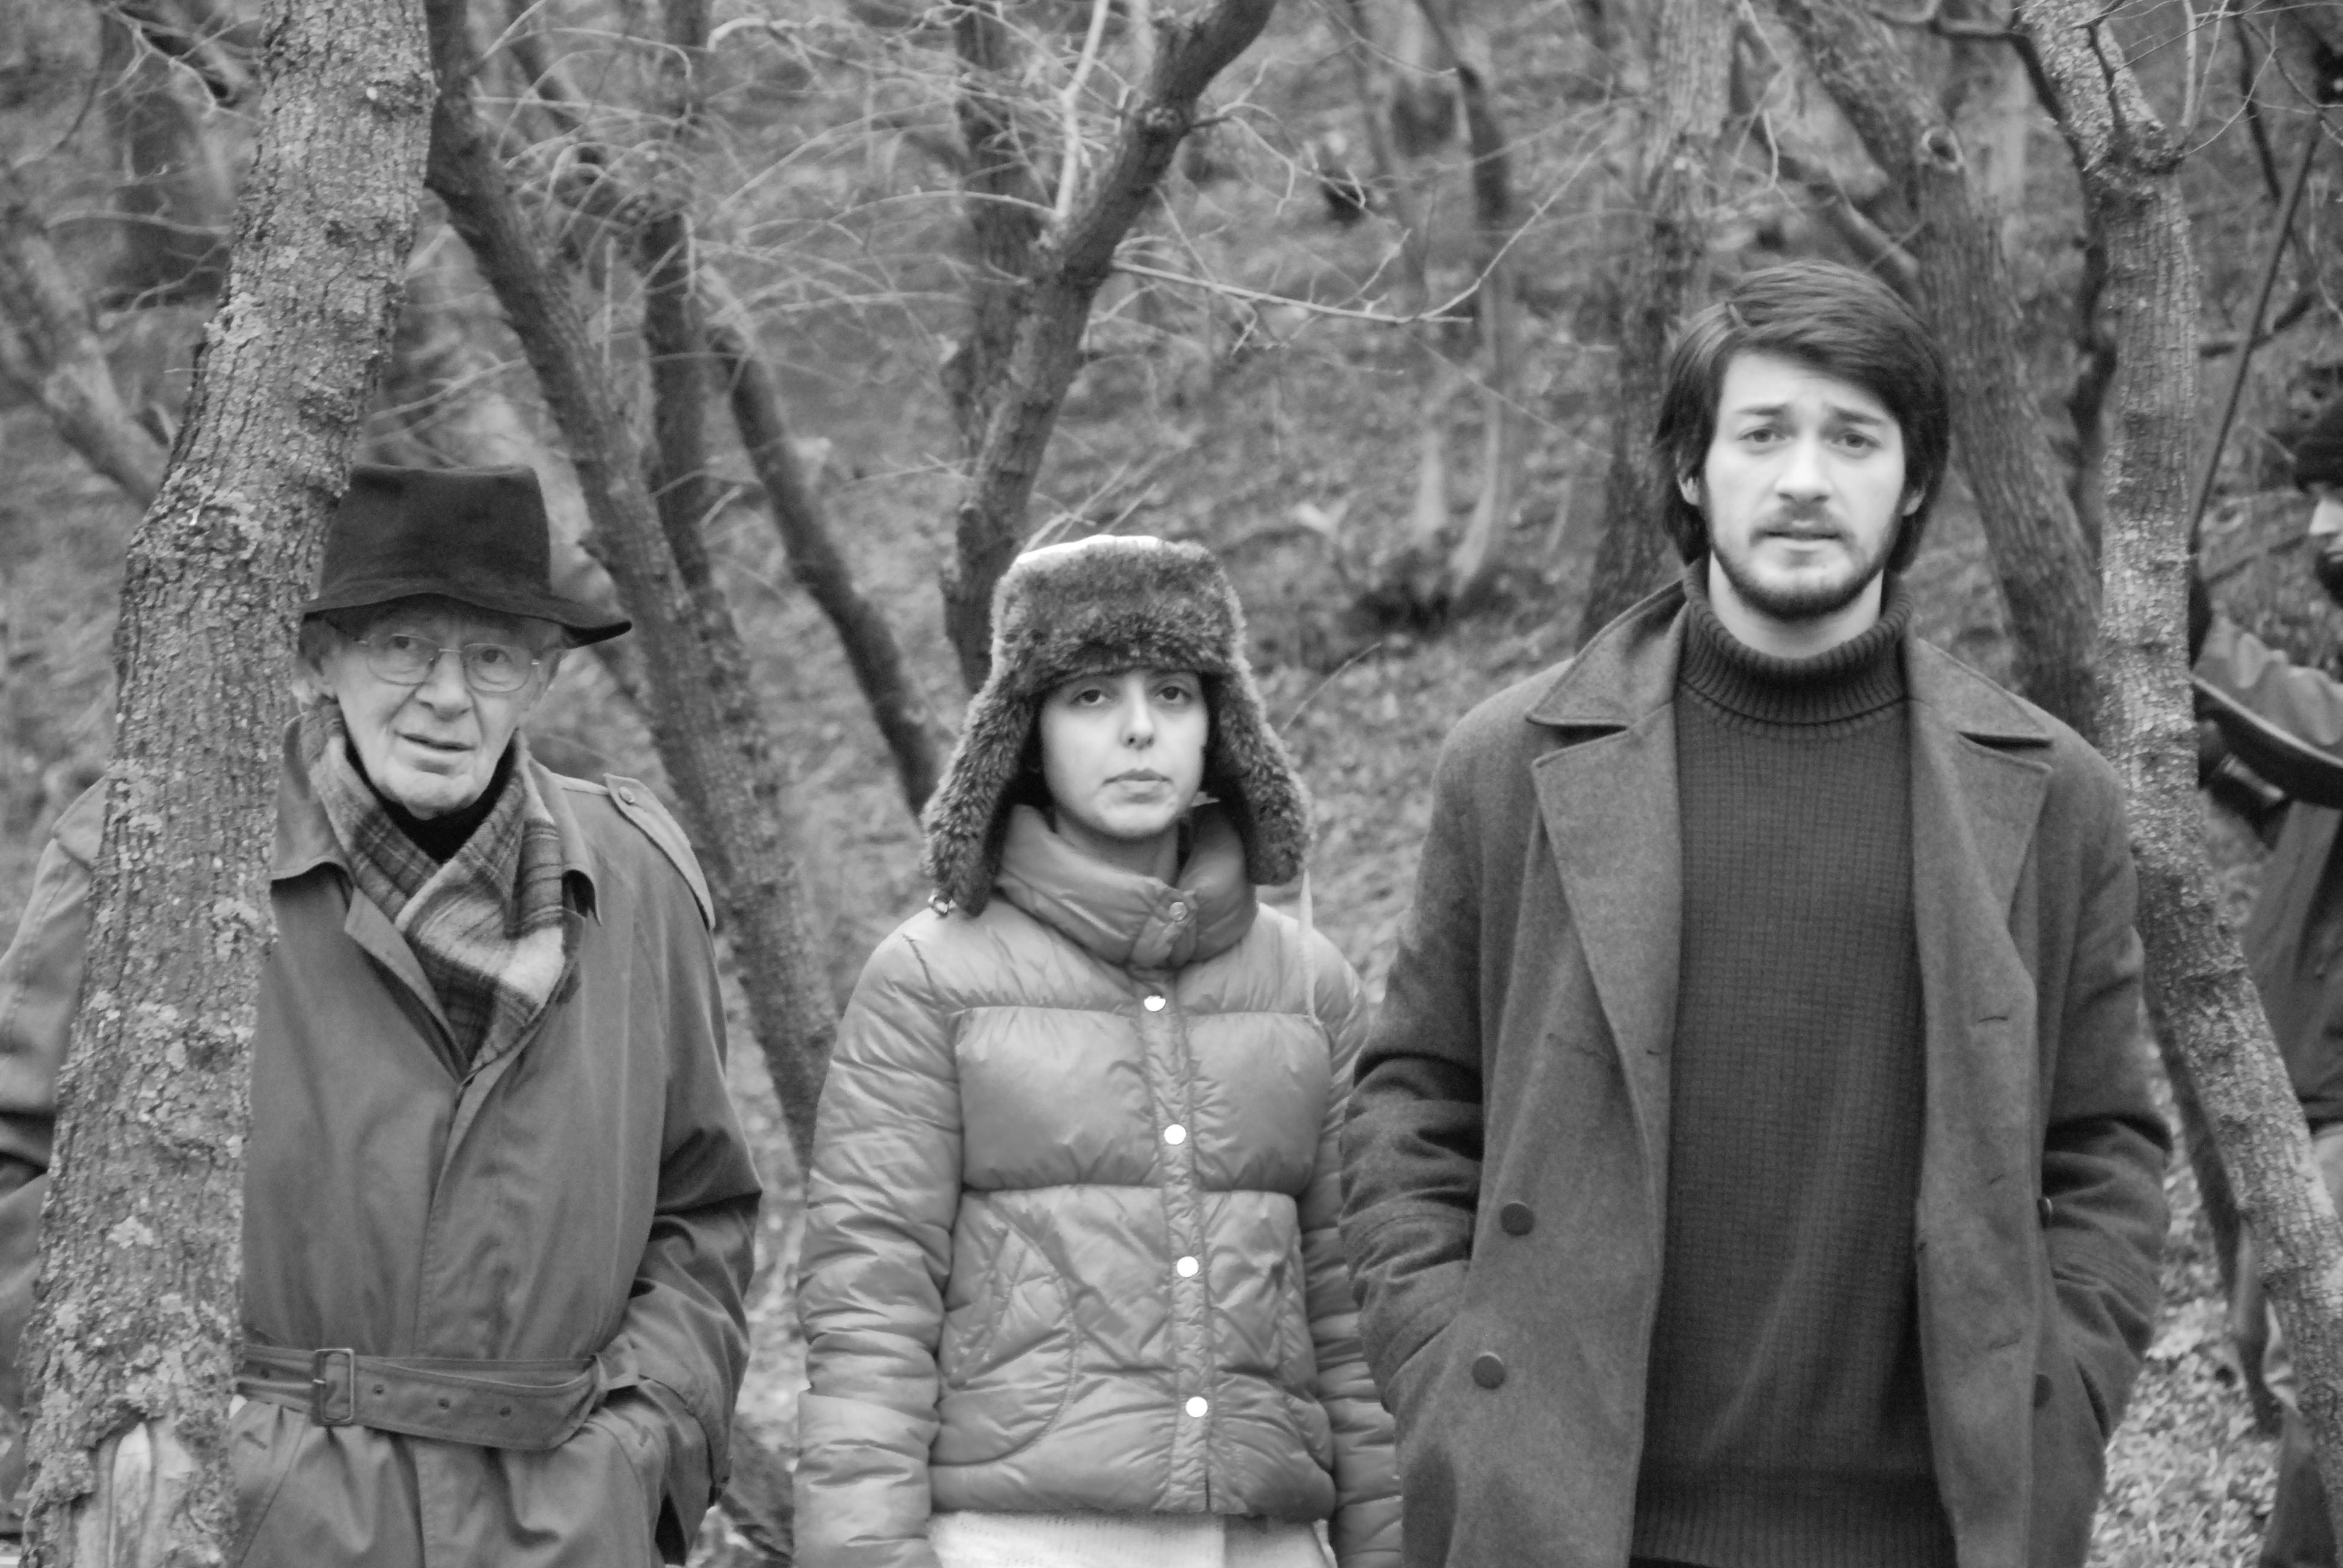 Dea Kulumbegashvili, Tornike Gogrichiani, and Koka Bziava in Le nid (2011)